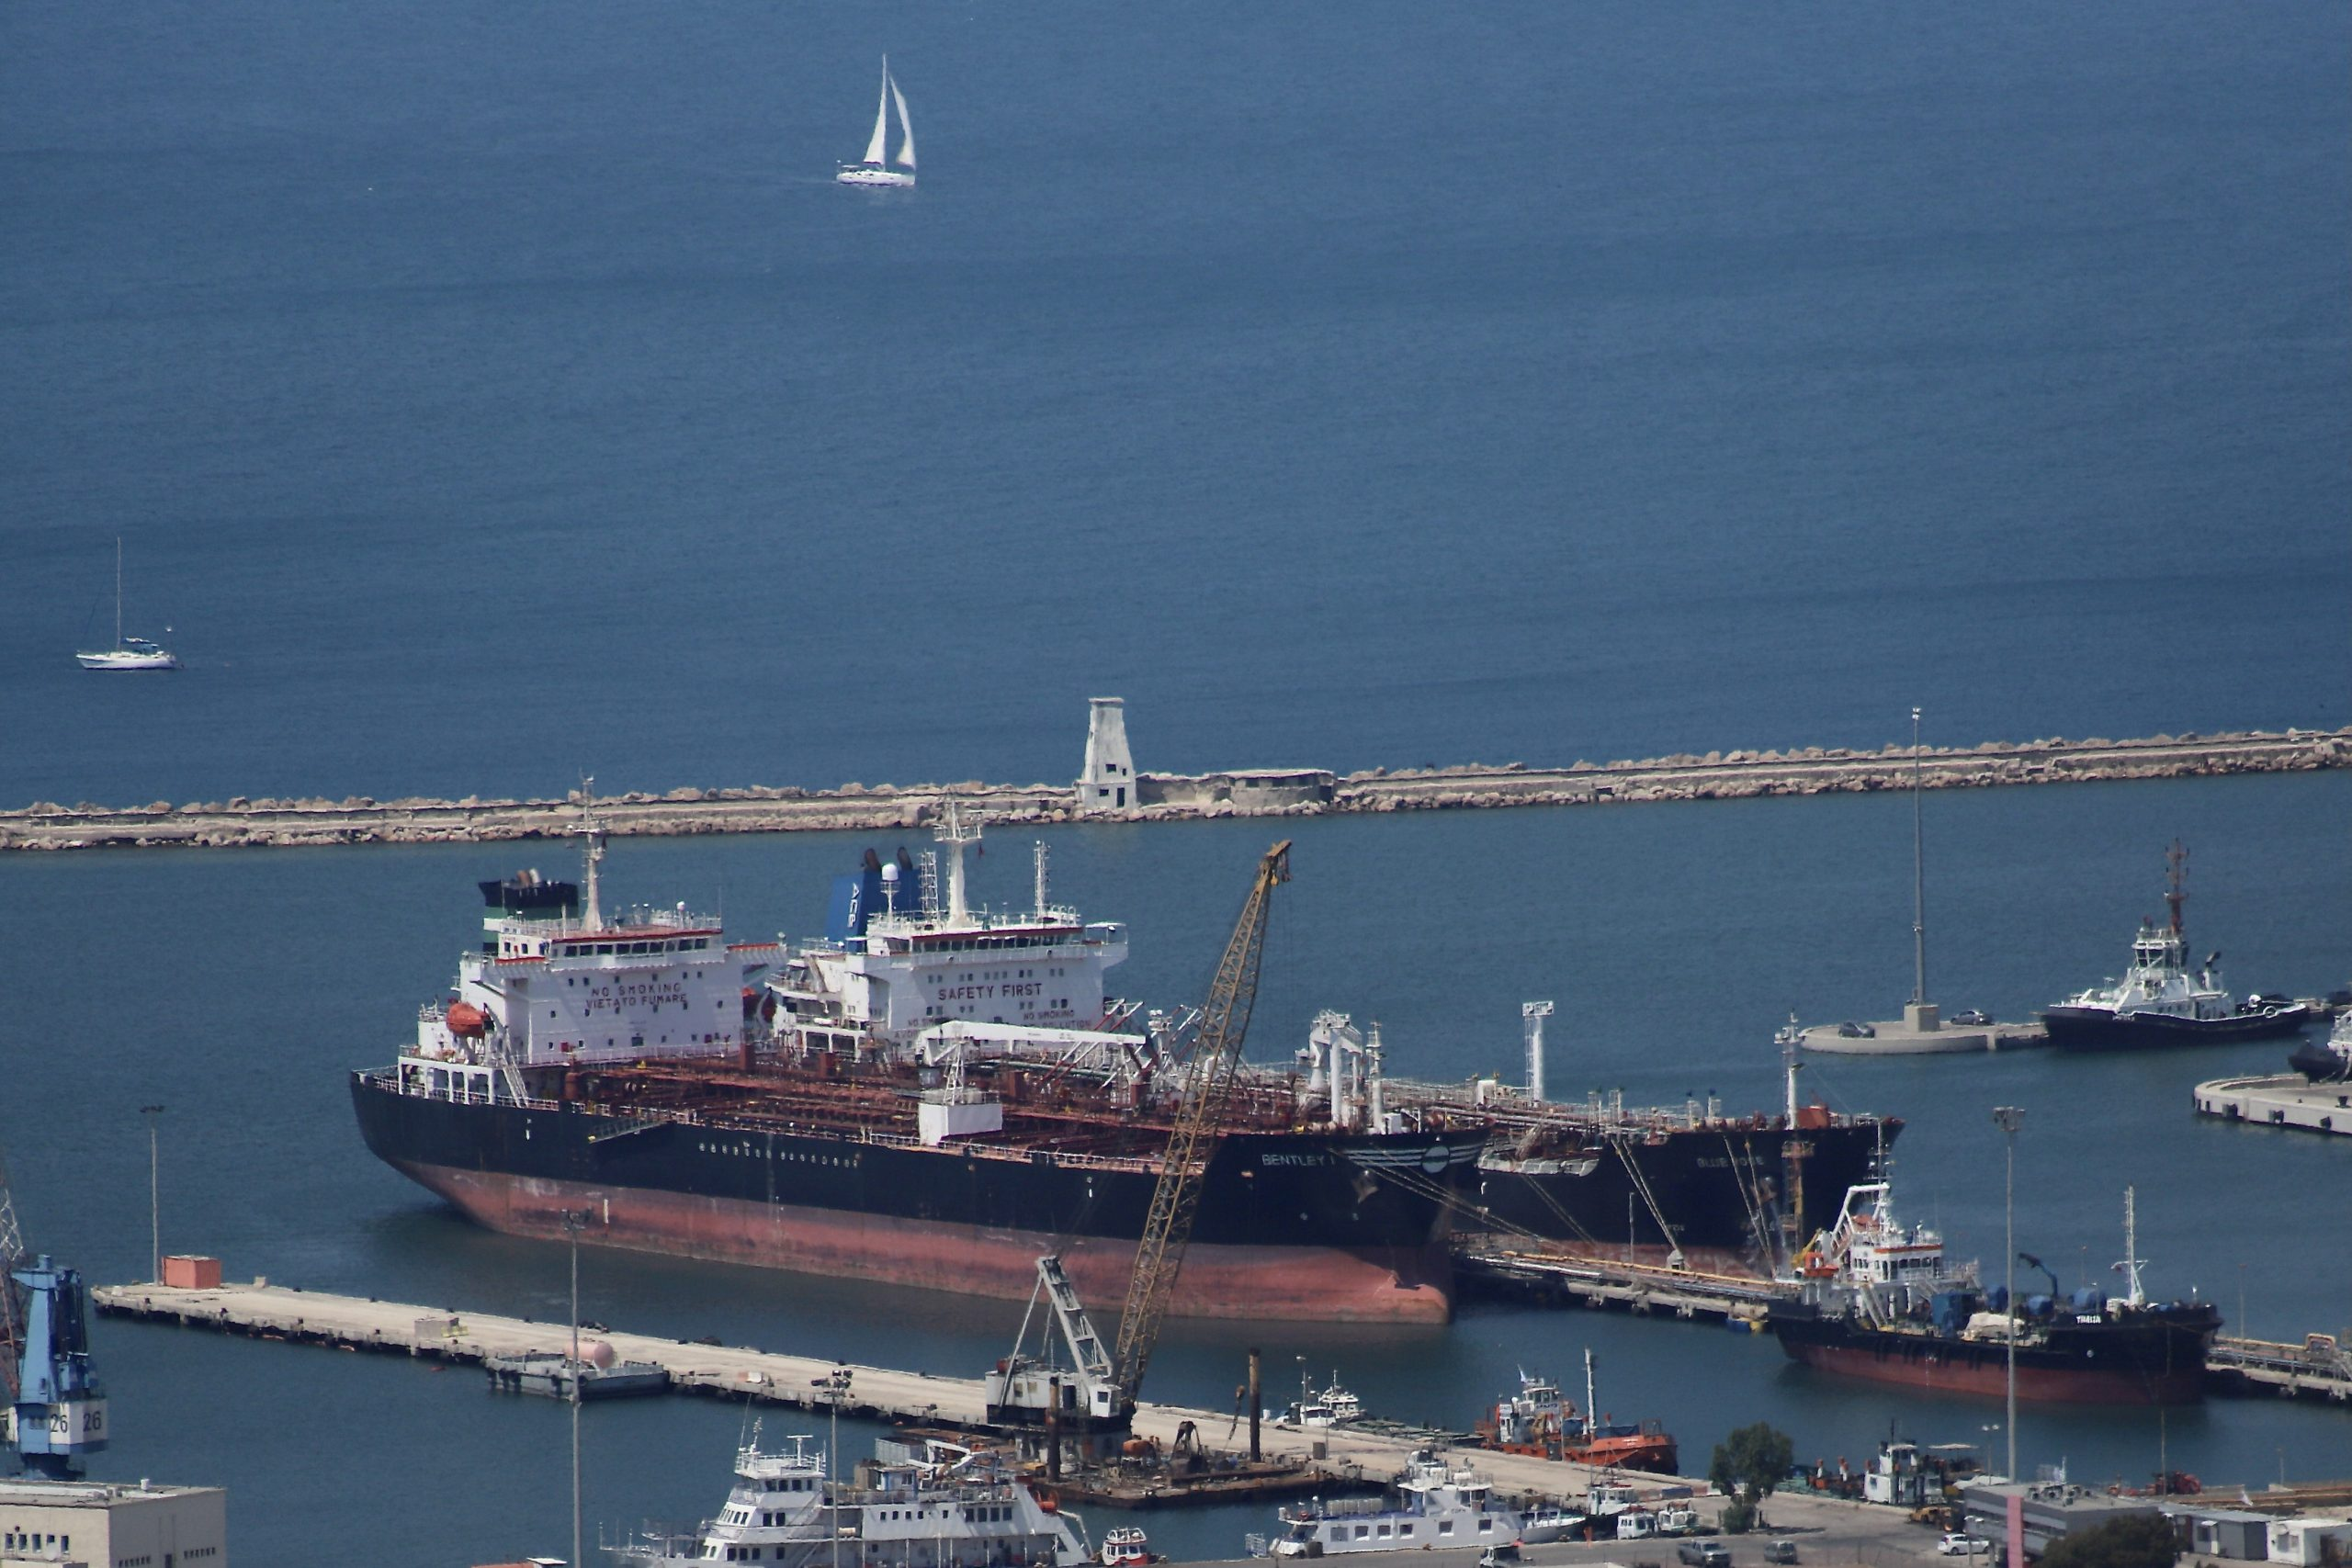 Oil tankers at the Haifa Port